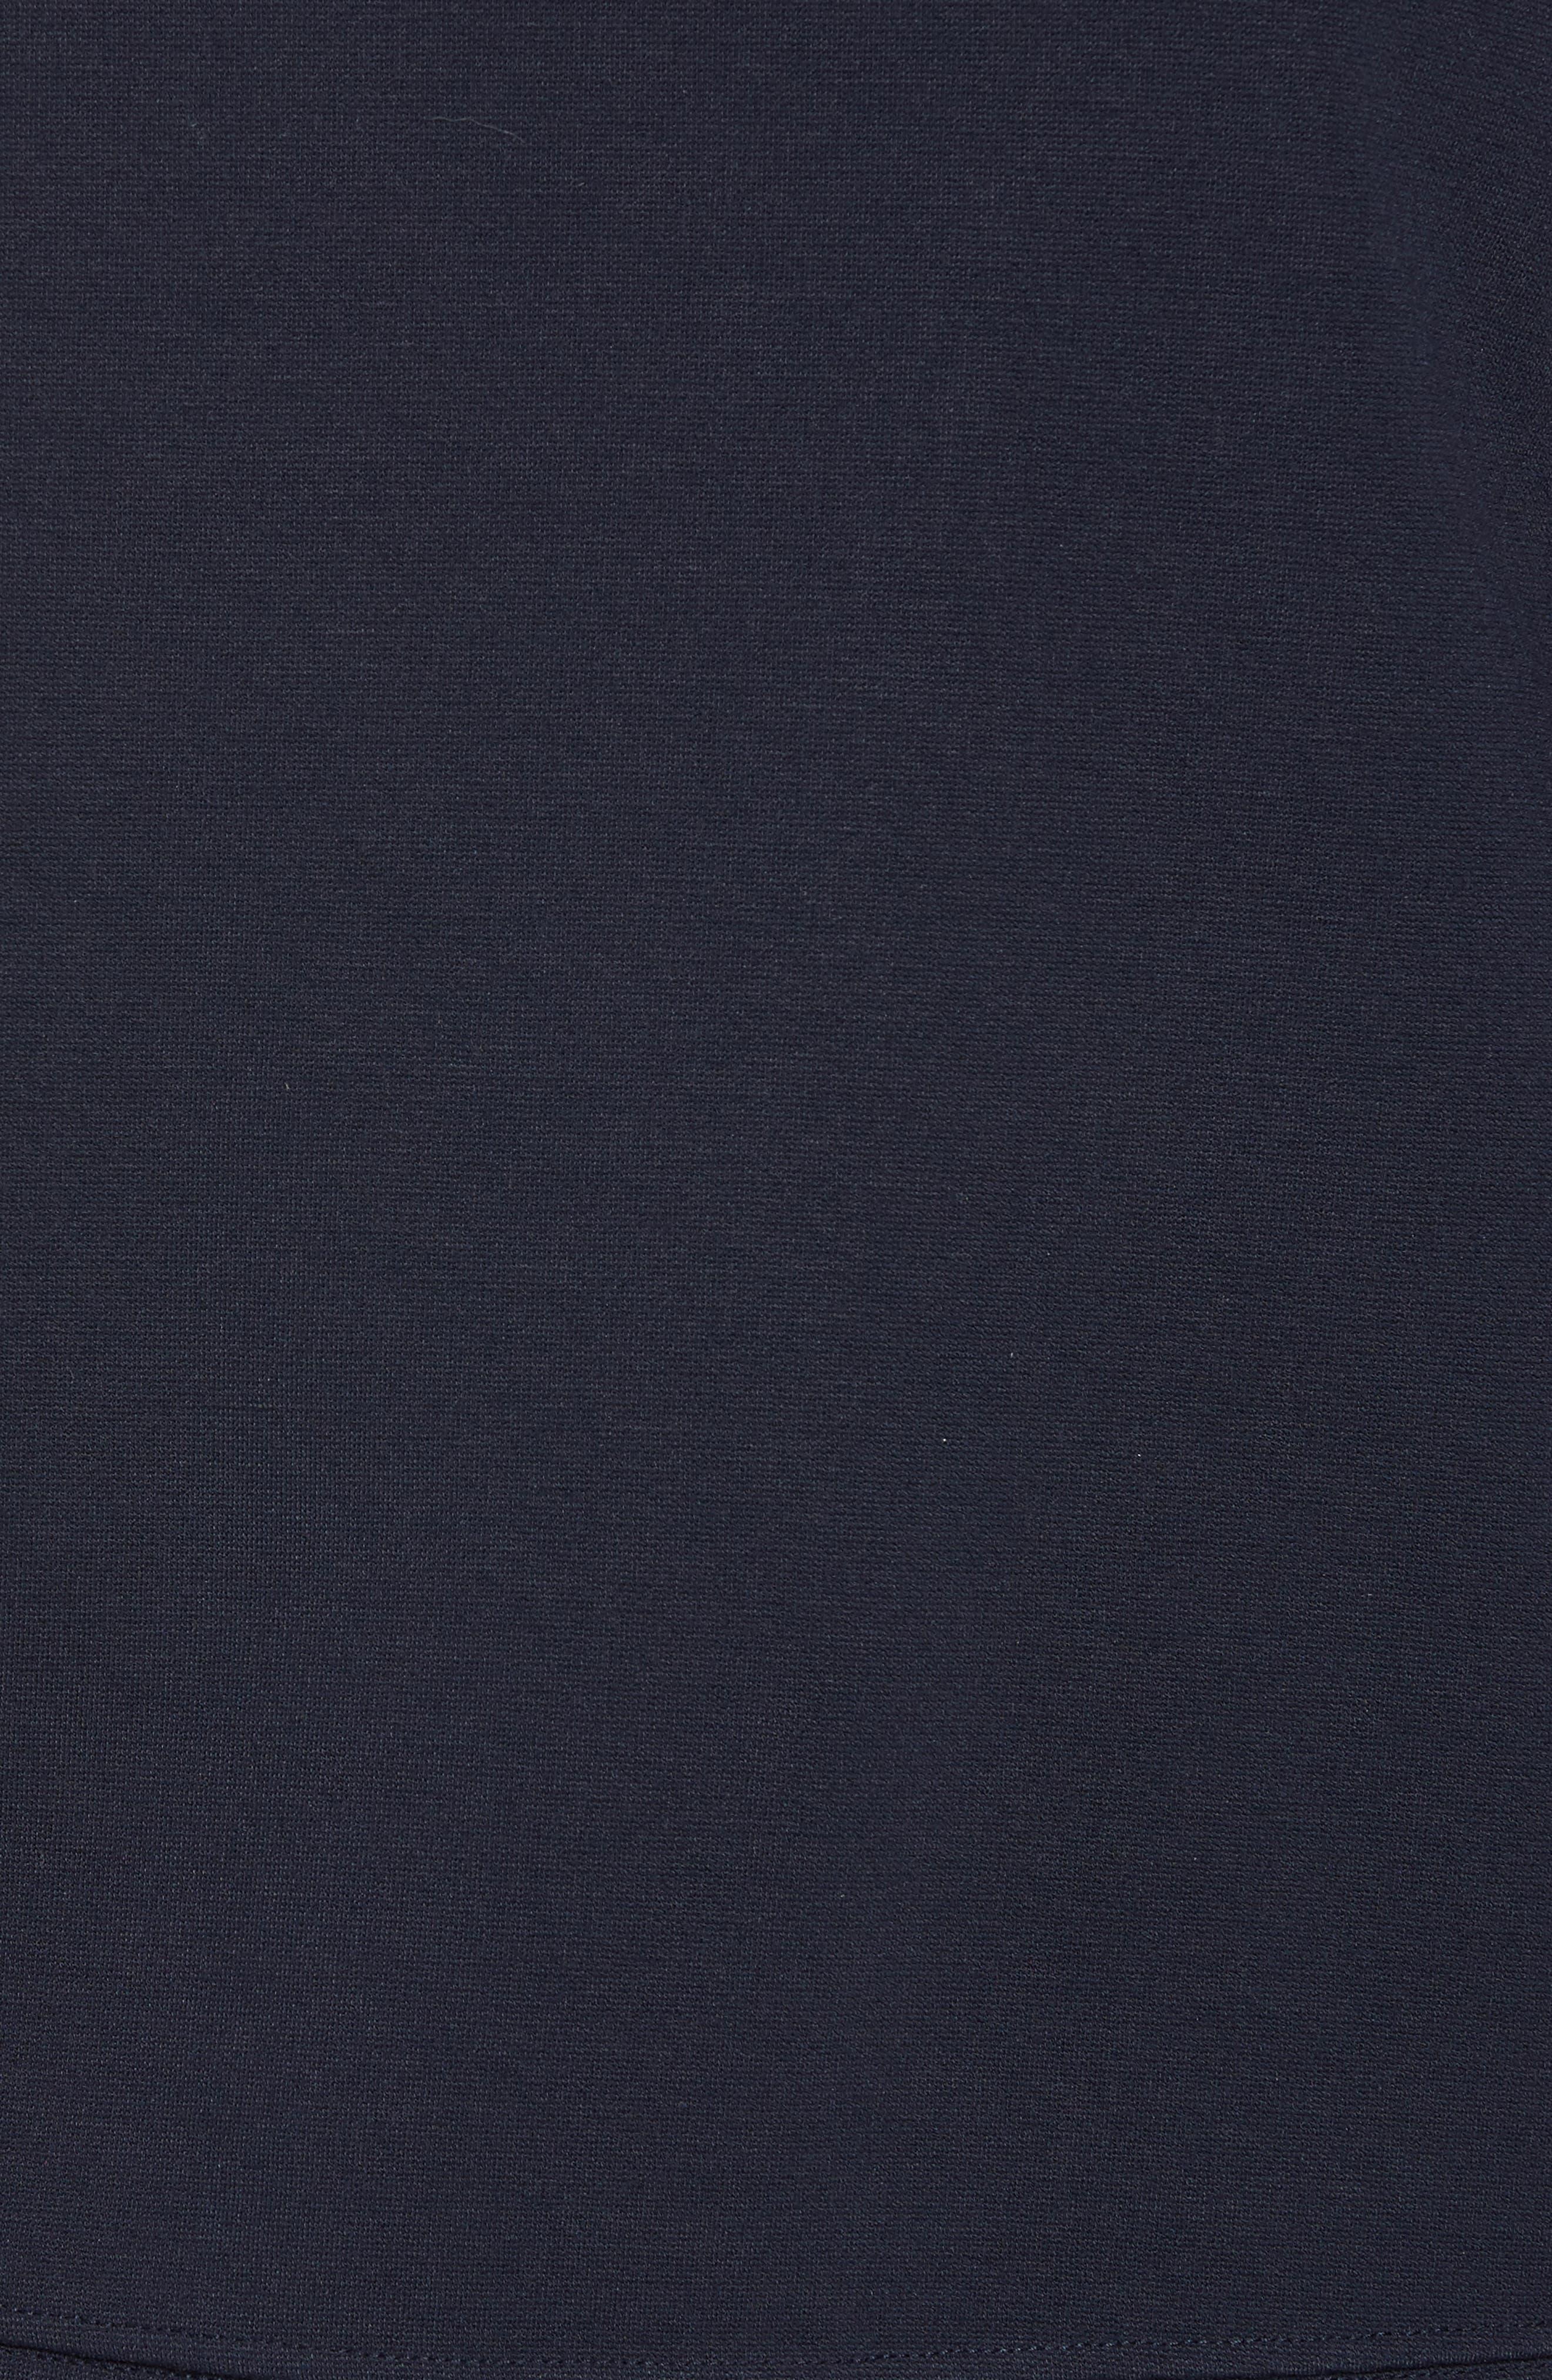 Woven Inset Ponte Knit Sweatshirt,                             Alternate thumbnail 5, color,                             Navy Night